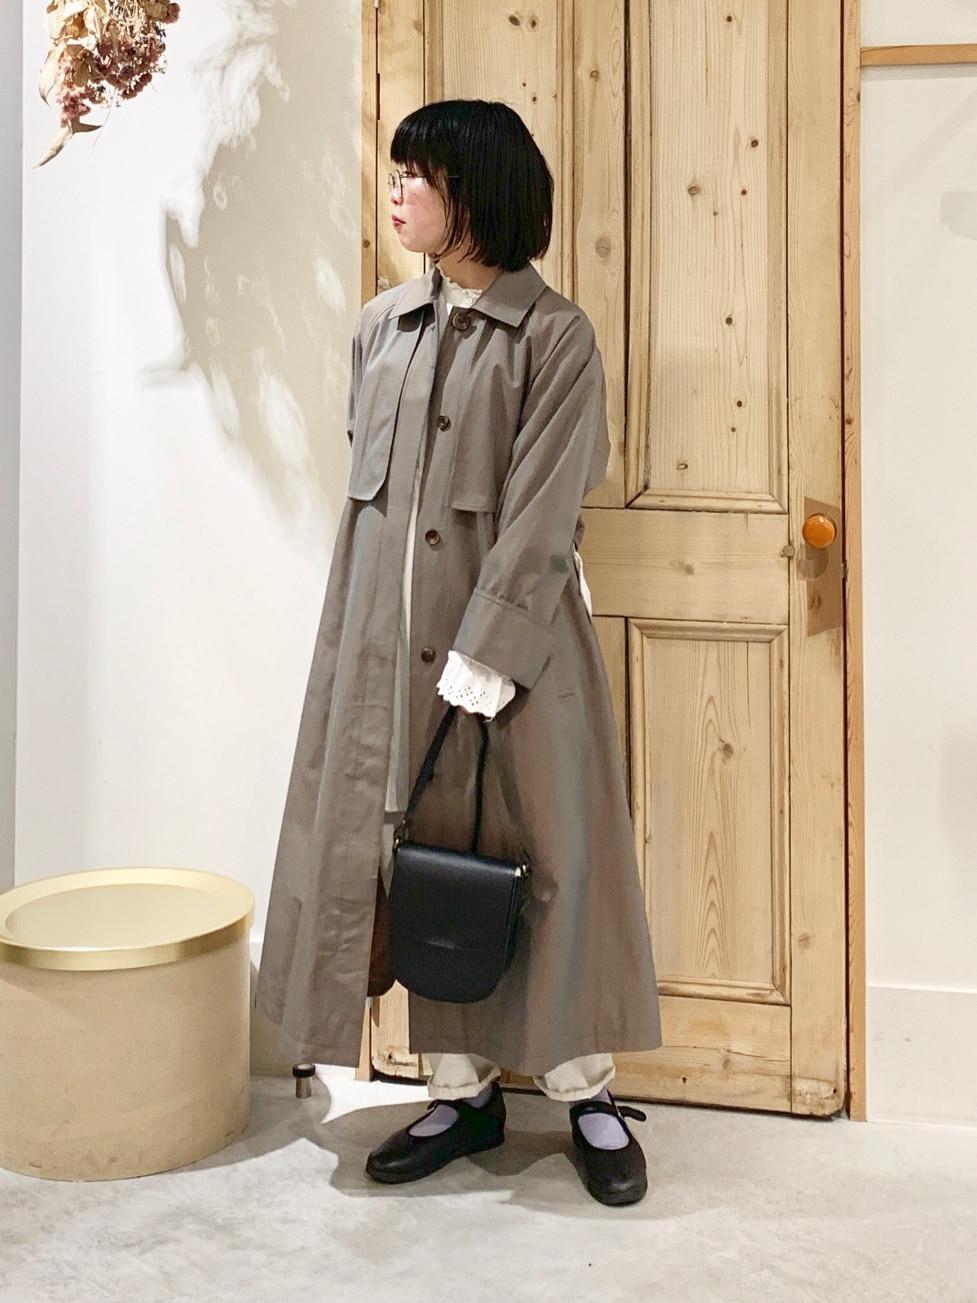 Malle chambre de charme 調布パルコ 身長:153cm 2021.02.17